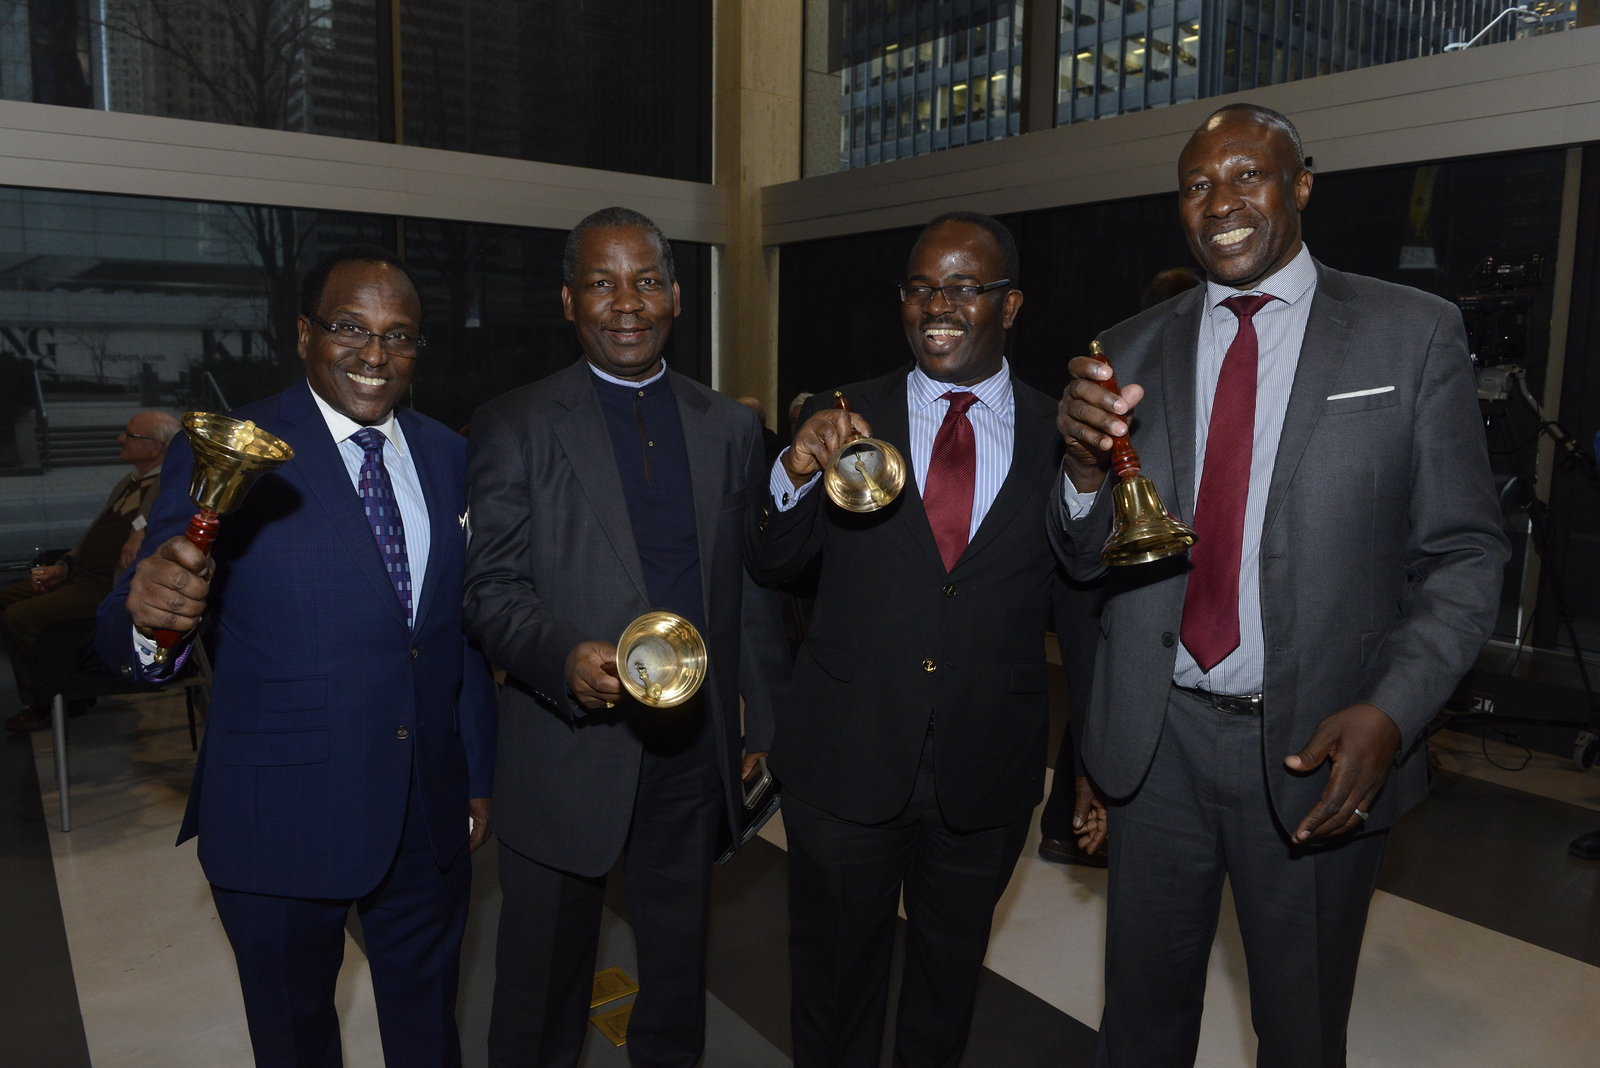 John Lanyasunya (Kenyan High Commissioner),  Simon Tuma-Waku (Mining Industry Association of Southern Africa),  Sulemanu Koney (ECOWAS Federation of Chamber of Mines), Frank Mugyenyi (African Union Commission)